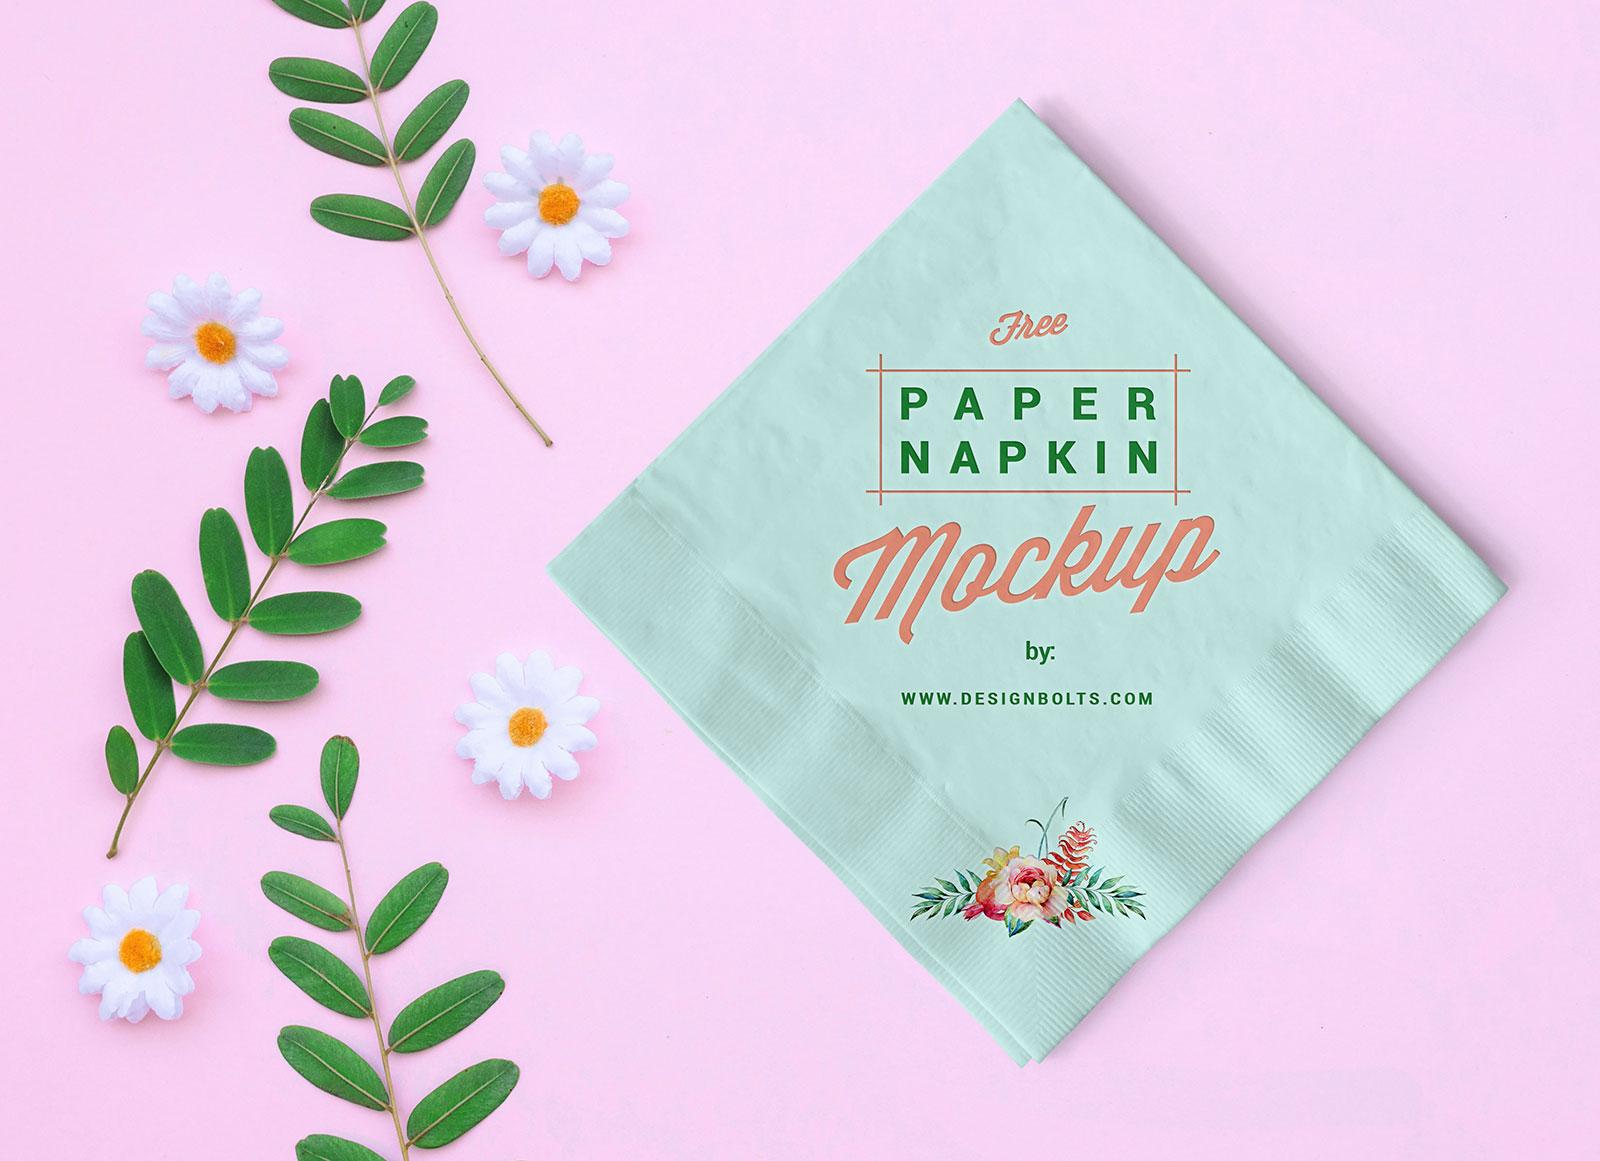 Free-Table-Paper-Napkin-Mockup-PSD-2